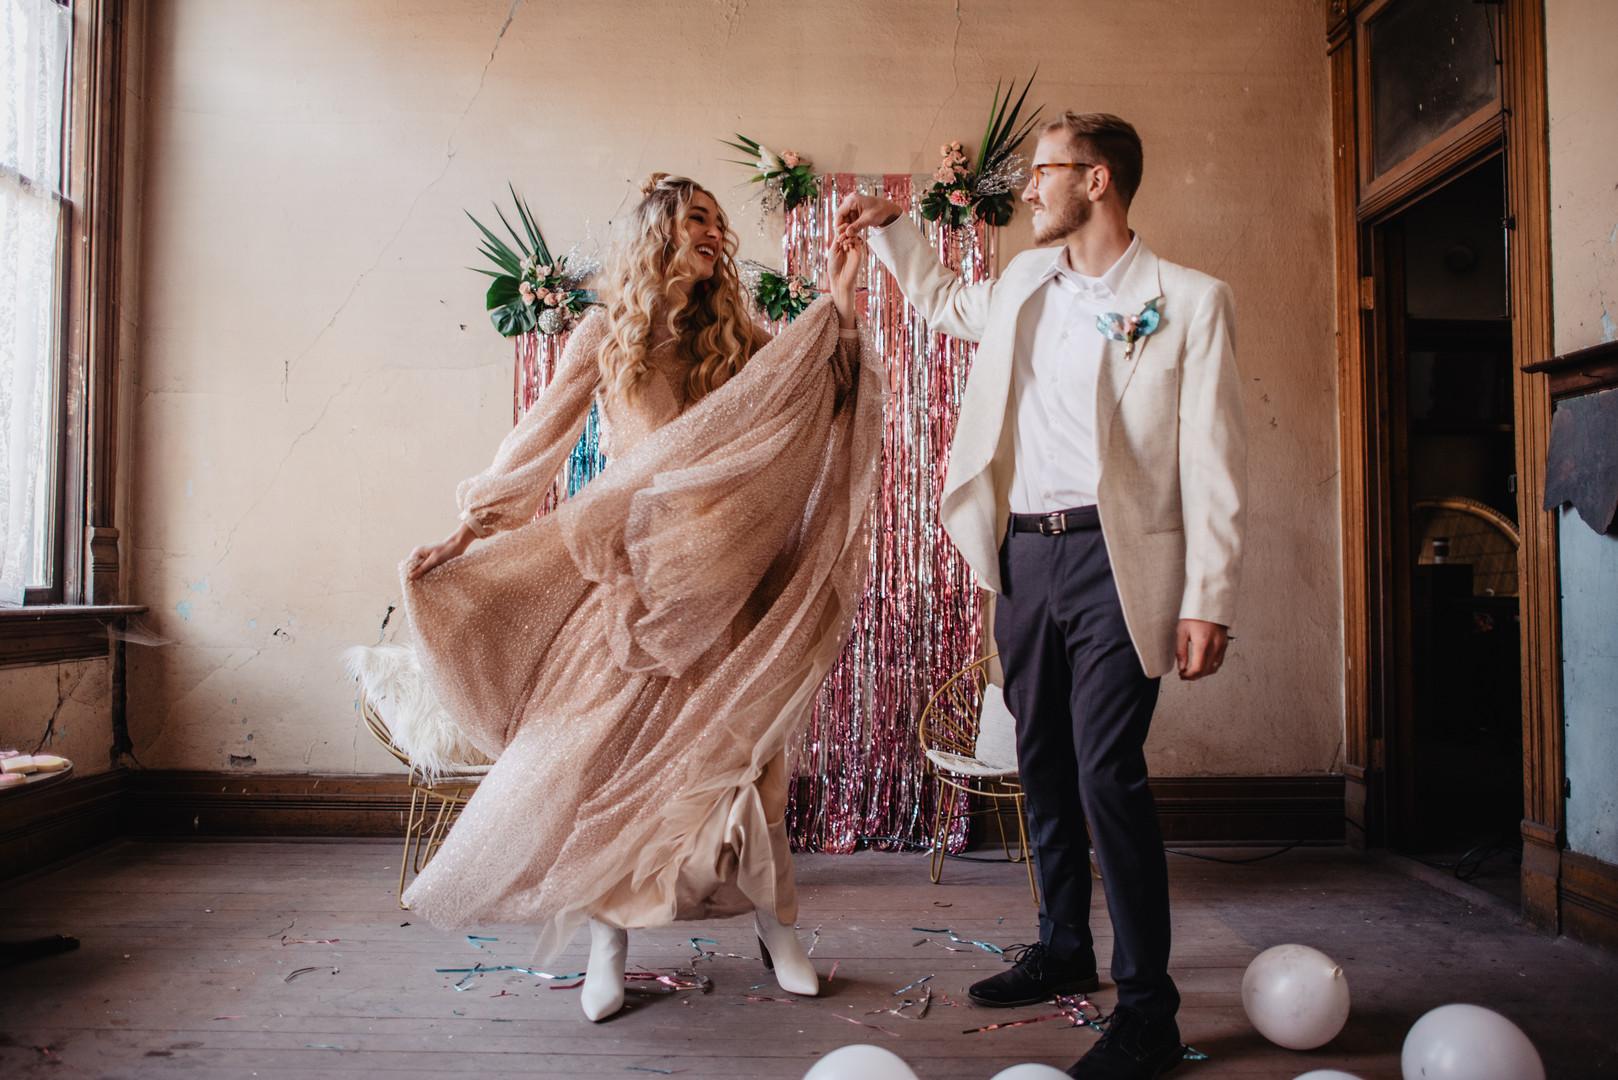 studio 54 inspired wedding_sneaks-4.jpg